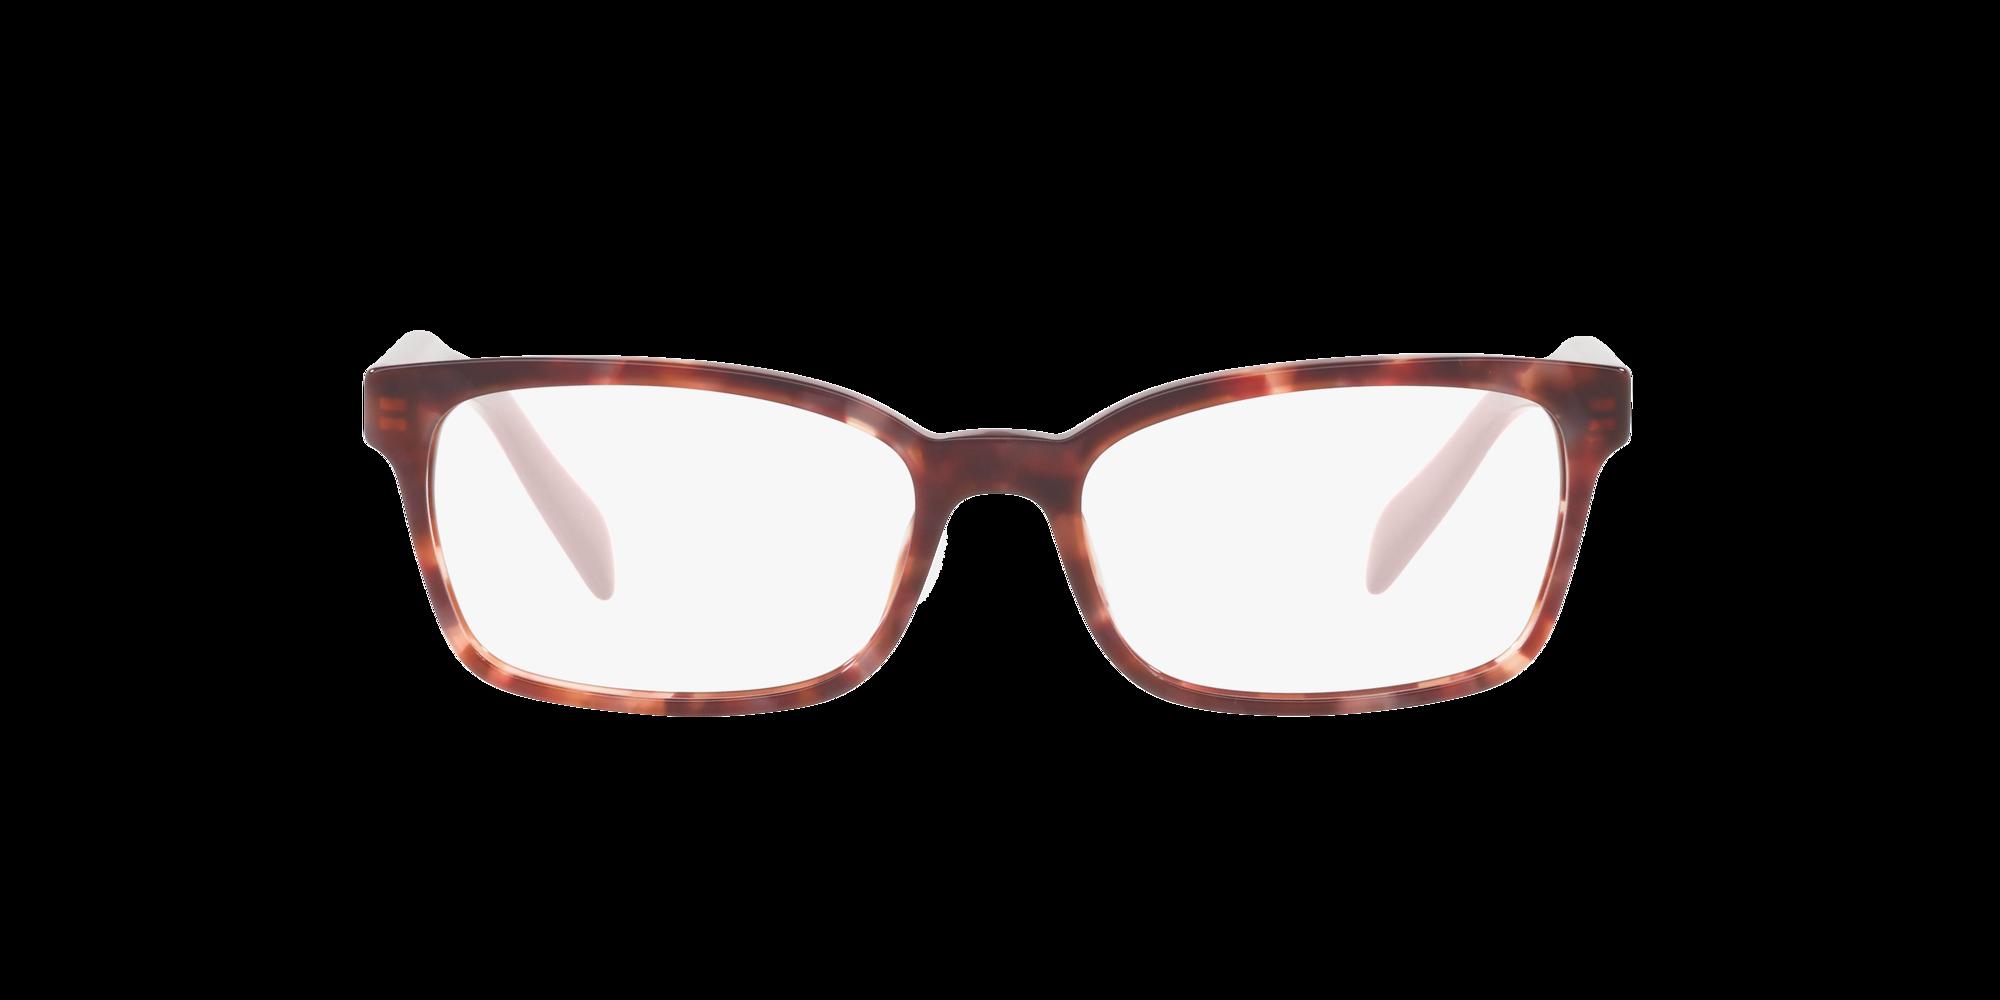 Image for PR 18TV from LensCrafters | Glasses, Prescription Glasses Online, Eyewear